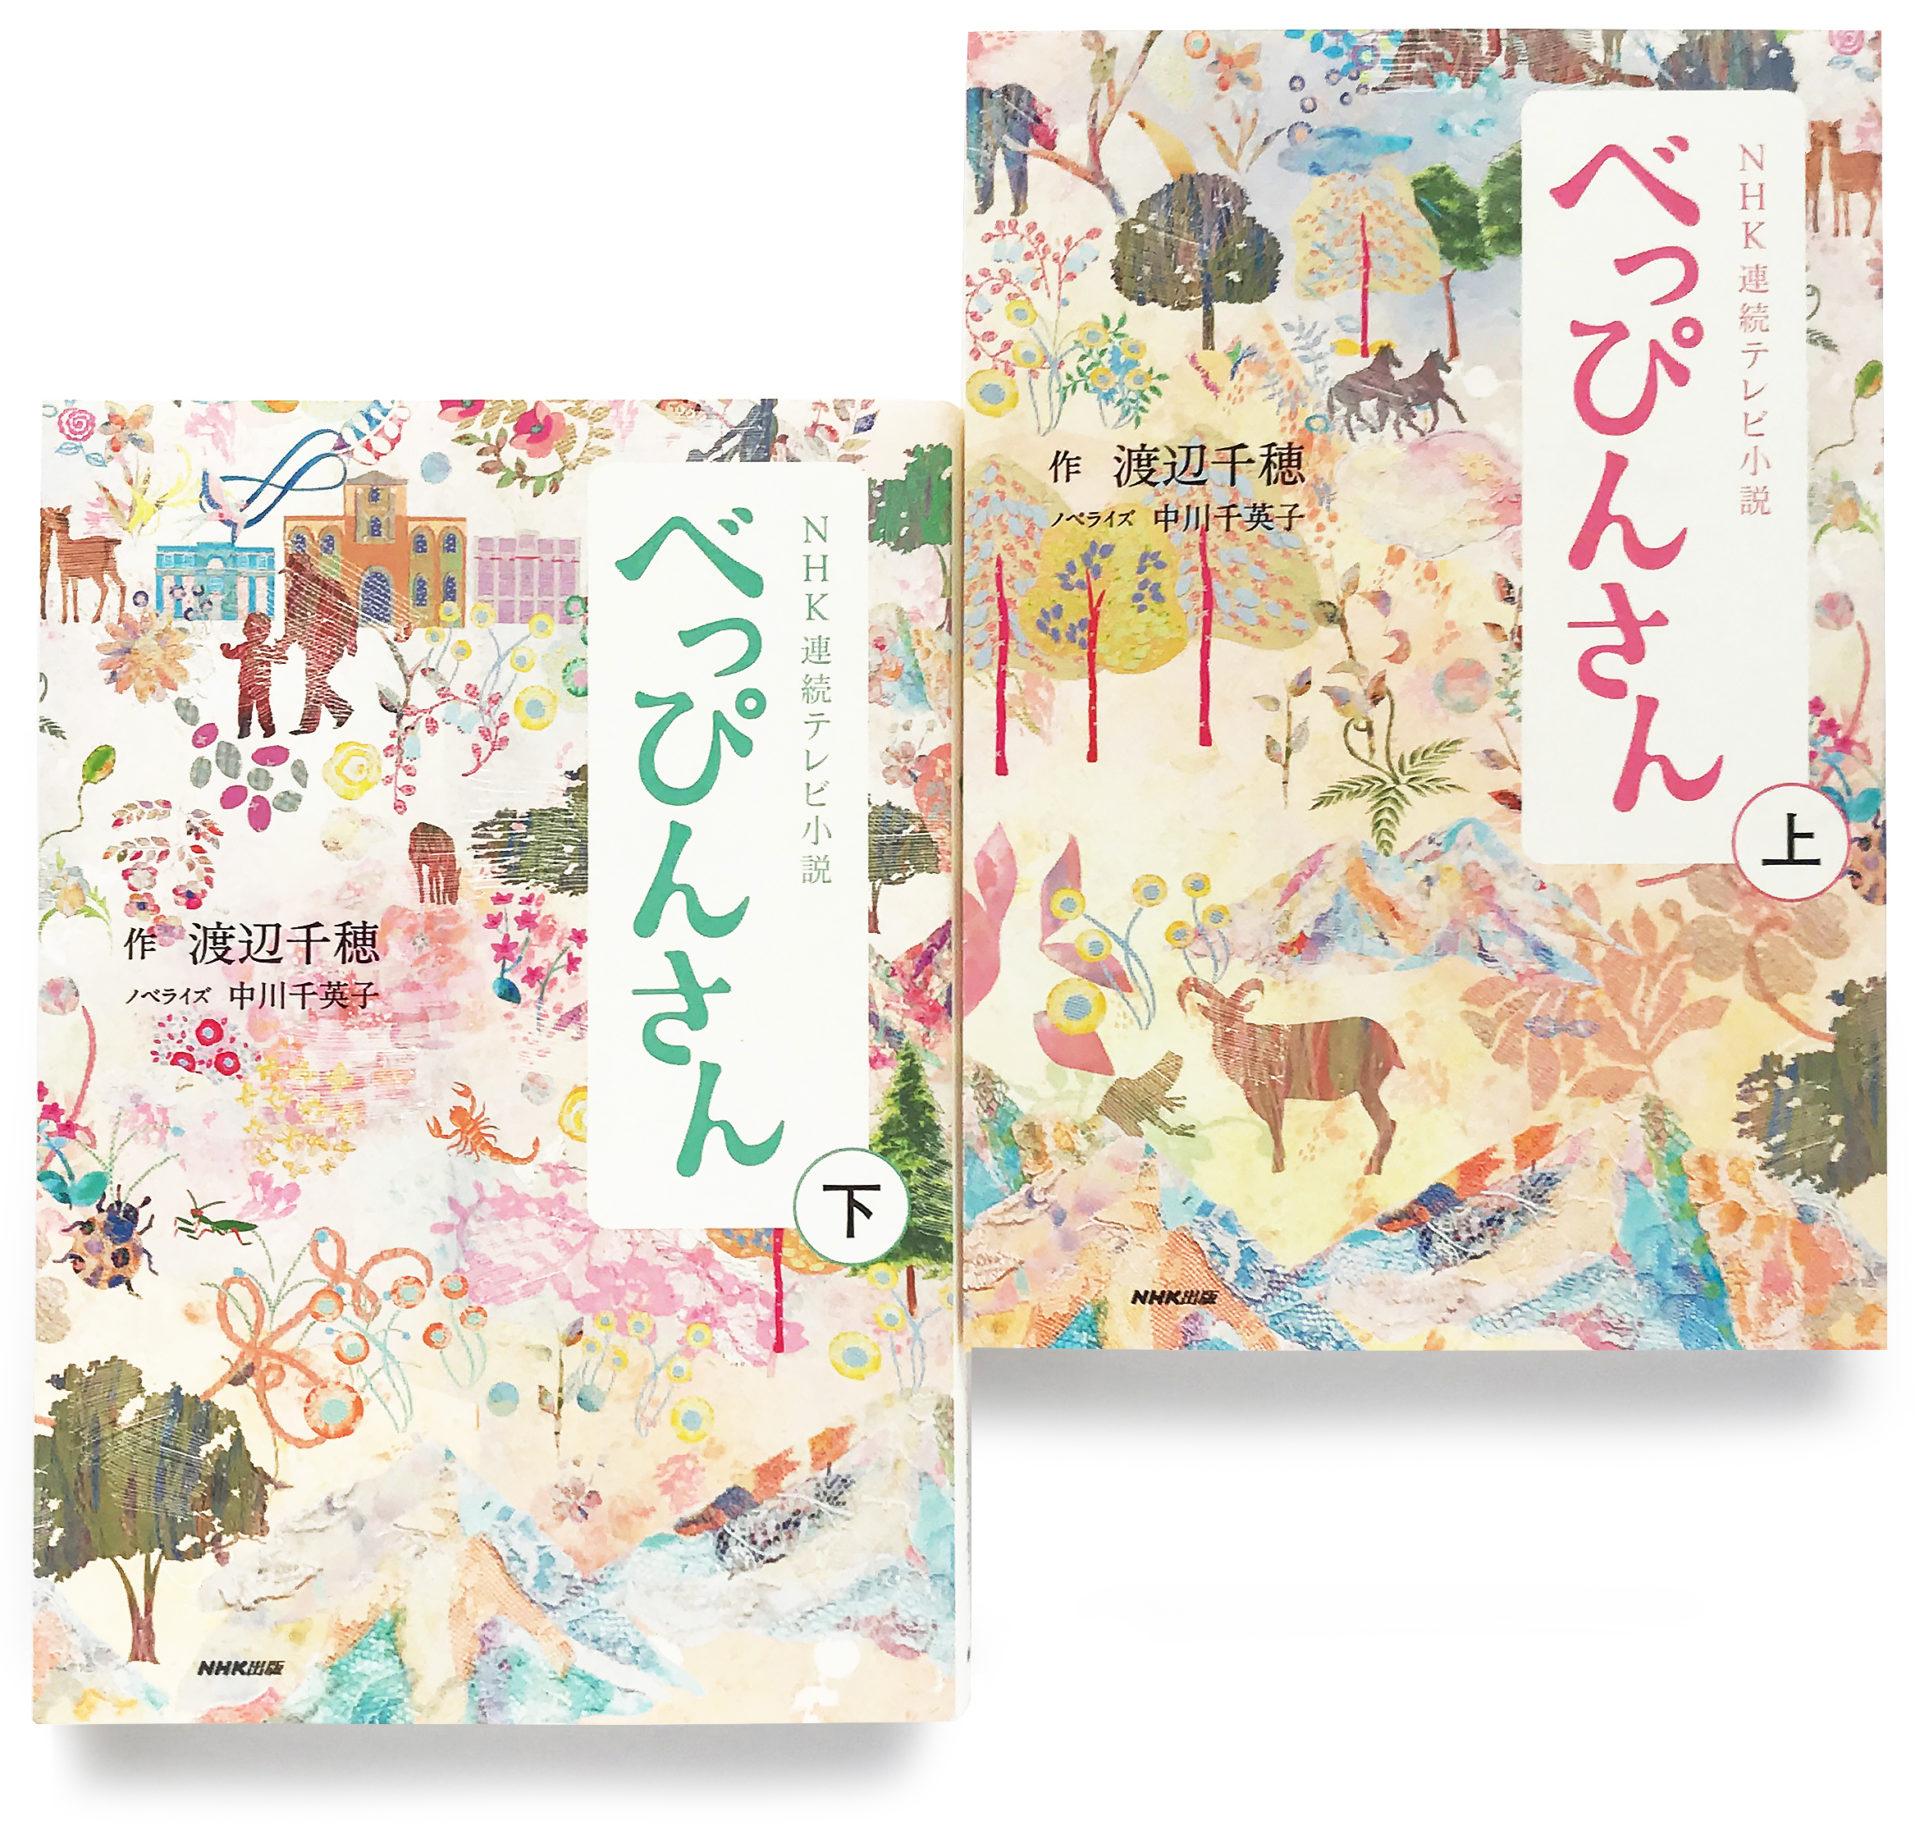 NHKドラマ・ガイド『連続テレビ小説 べっぴんさん』 5